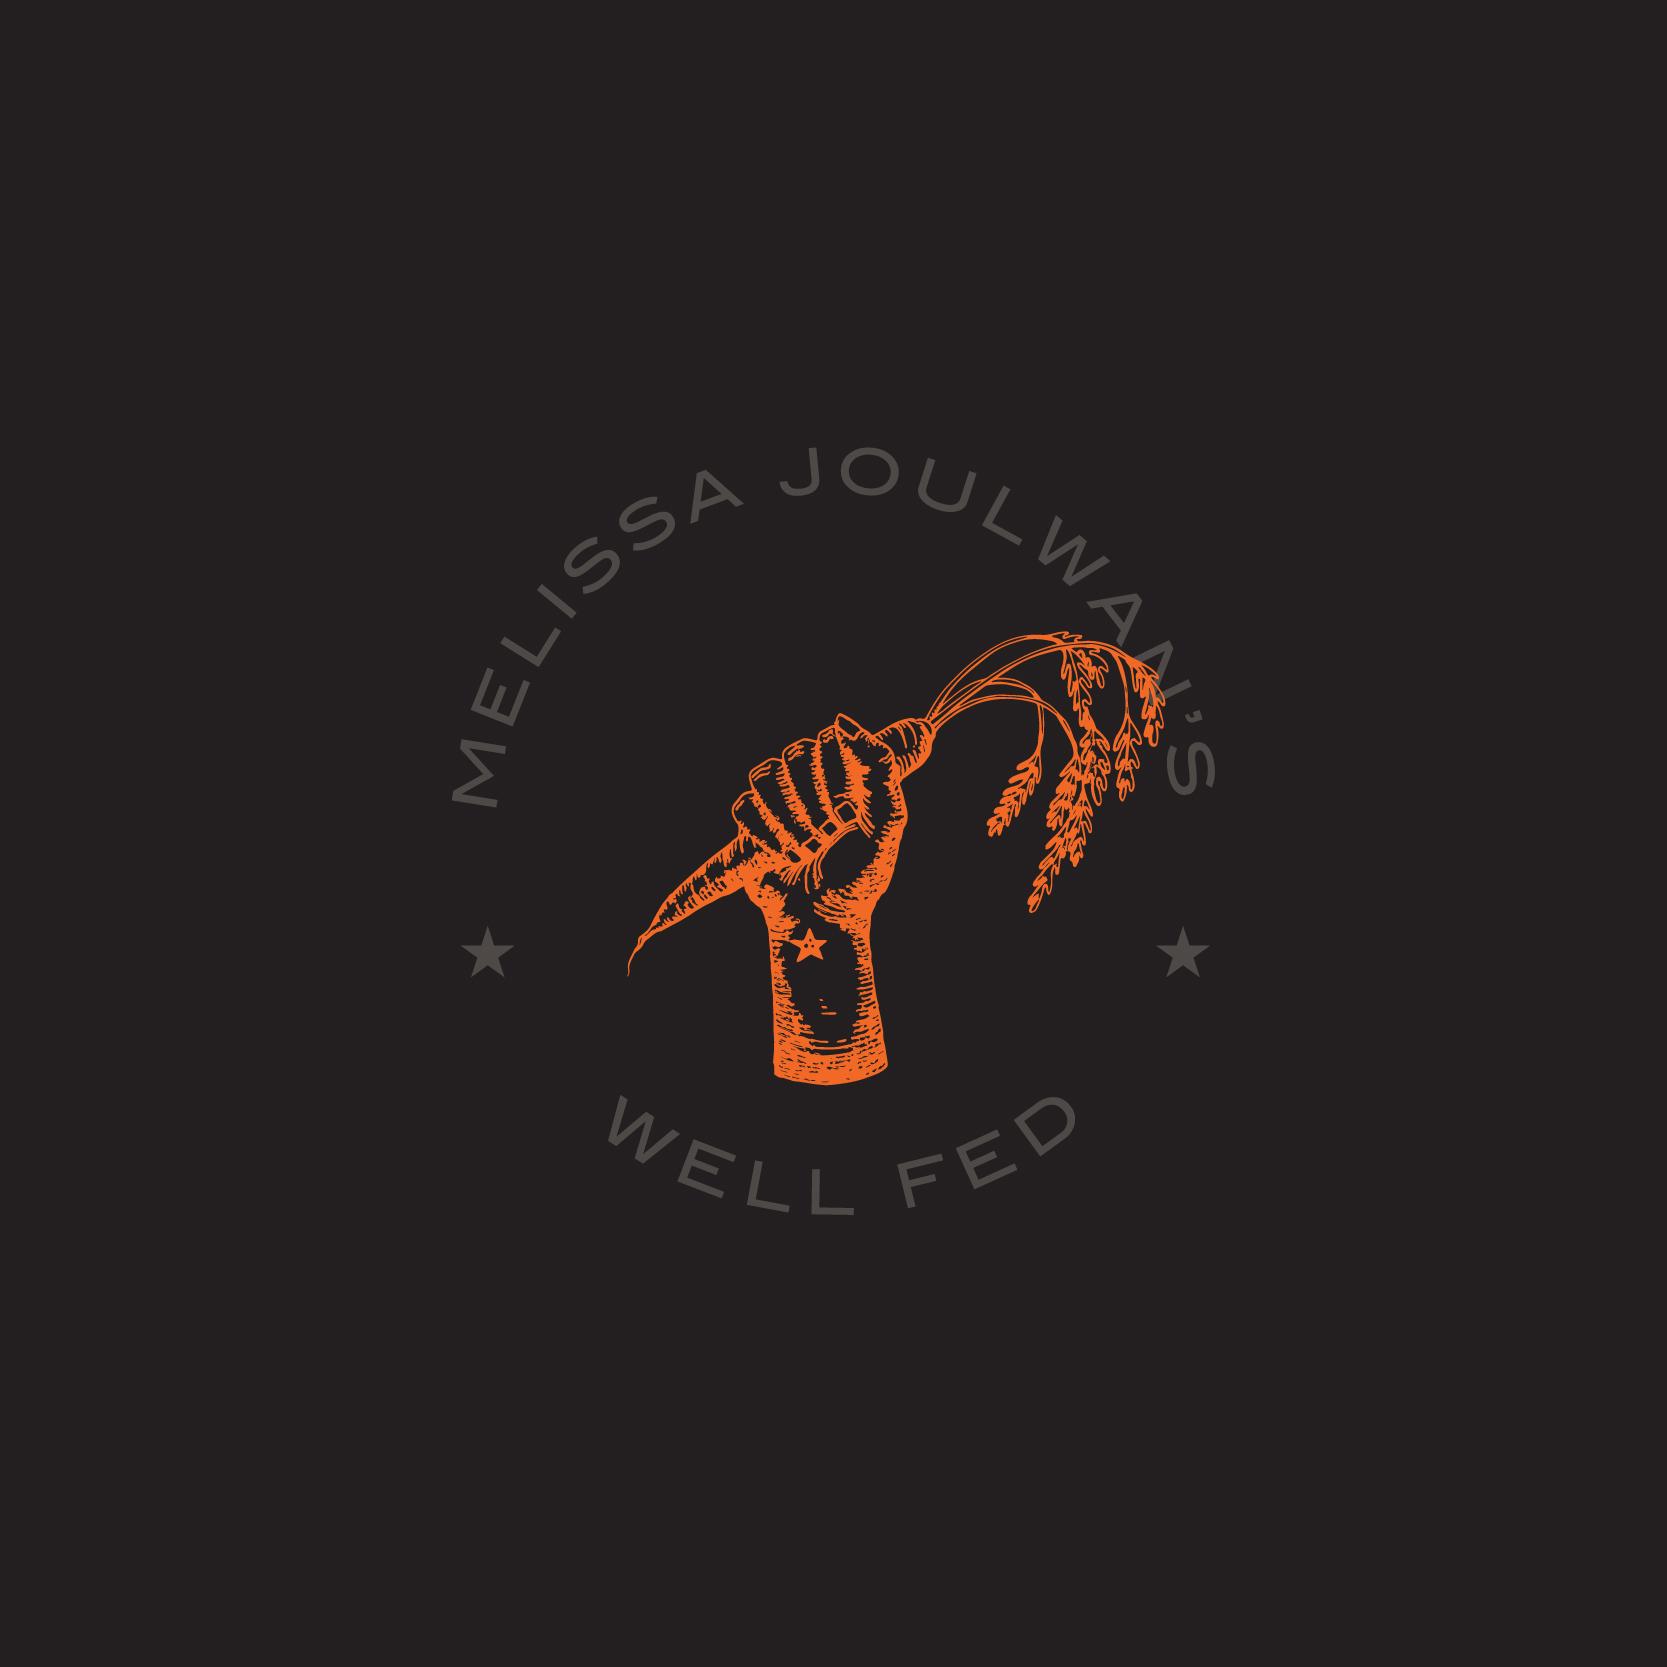 WellFed_Portfolio-02.jpg